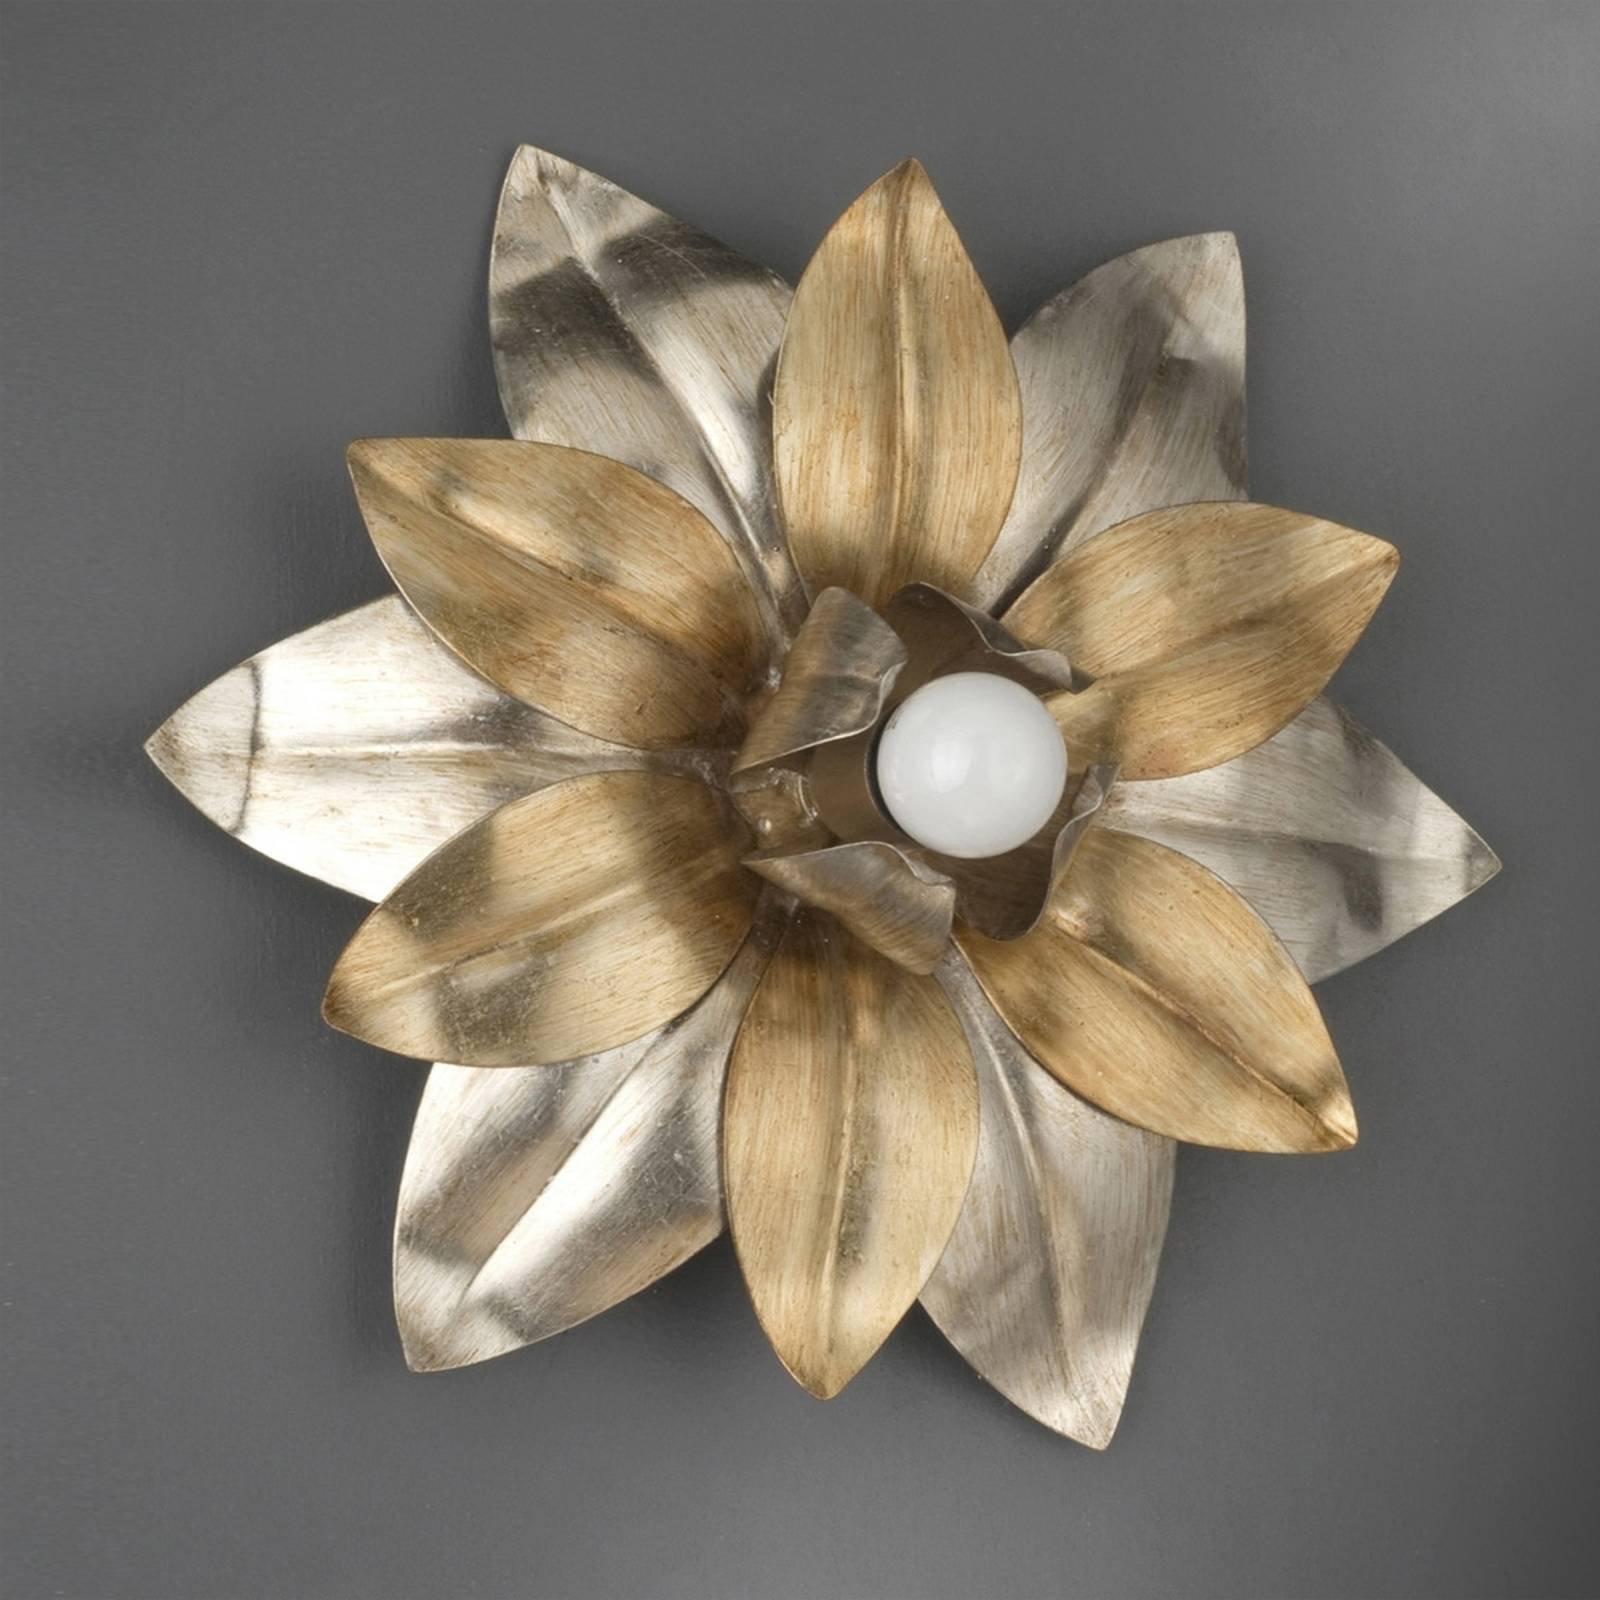 Vegglampe Marsala i blomsterform